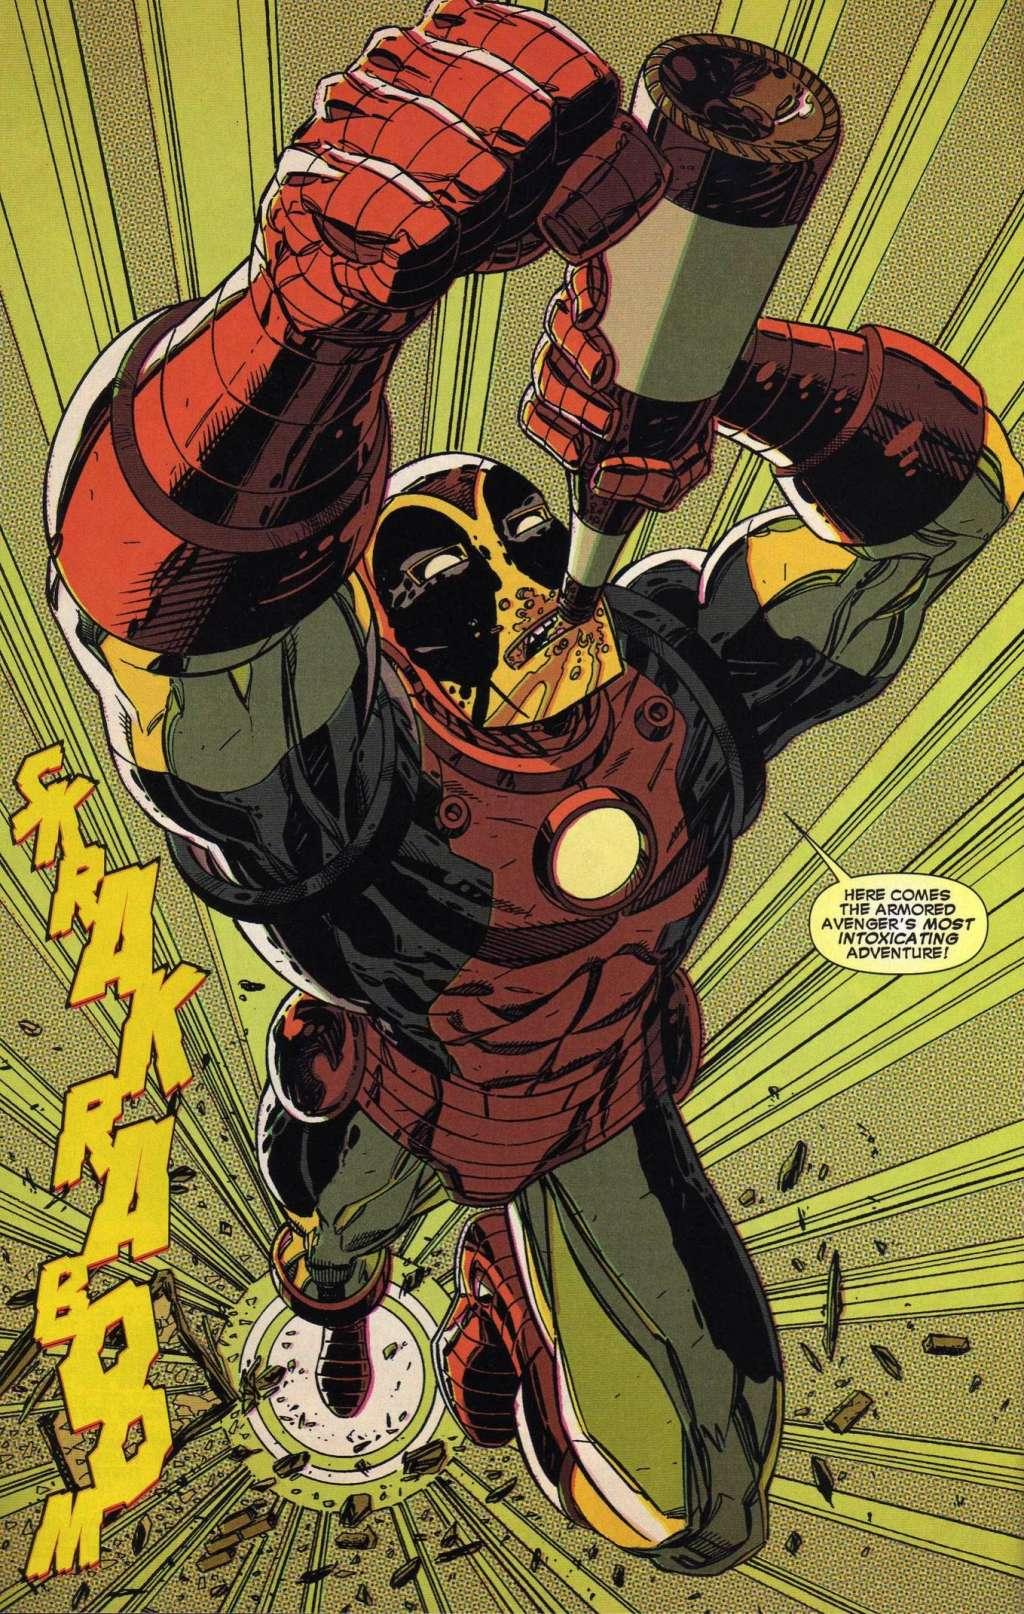 best-moments-of-deadpool-comics-003-drunk-iron-man-armor ...